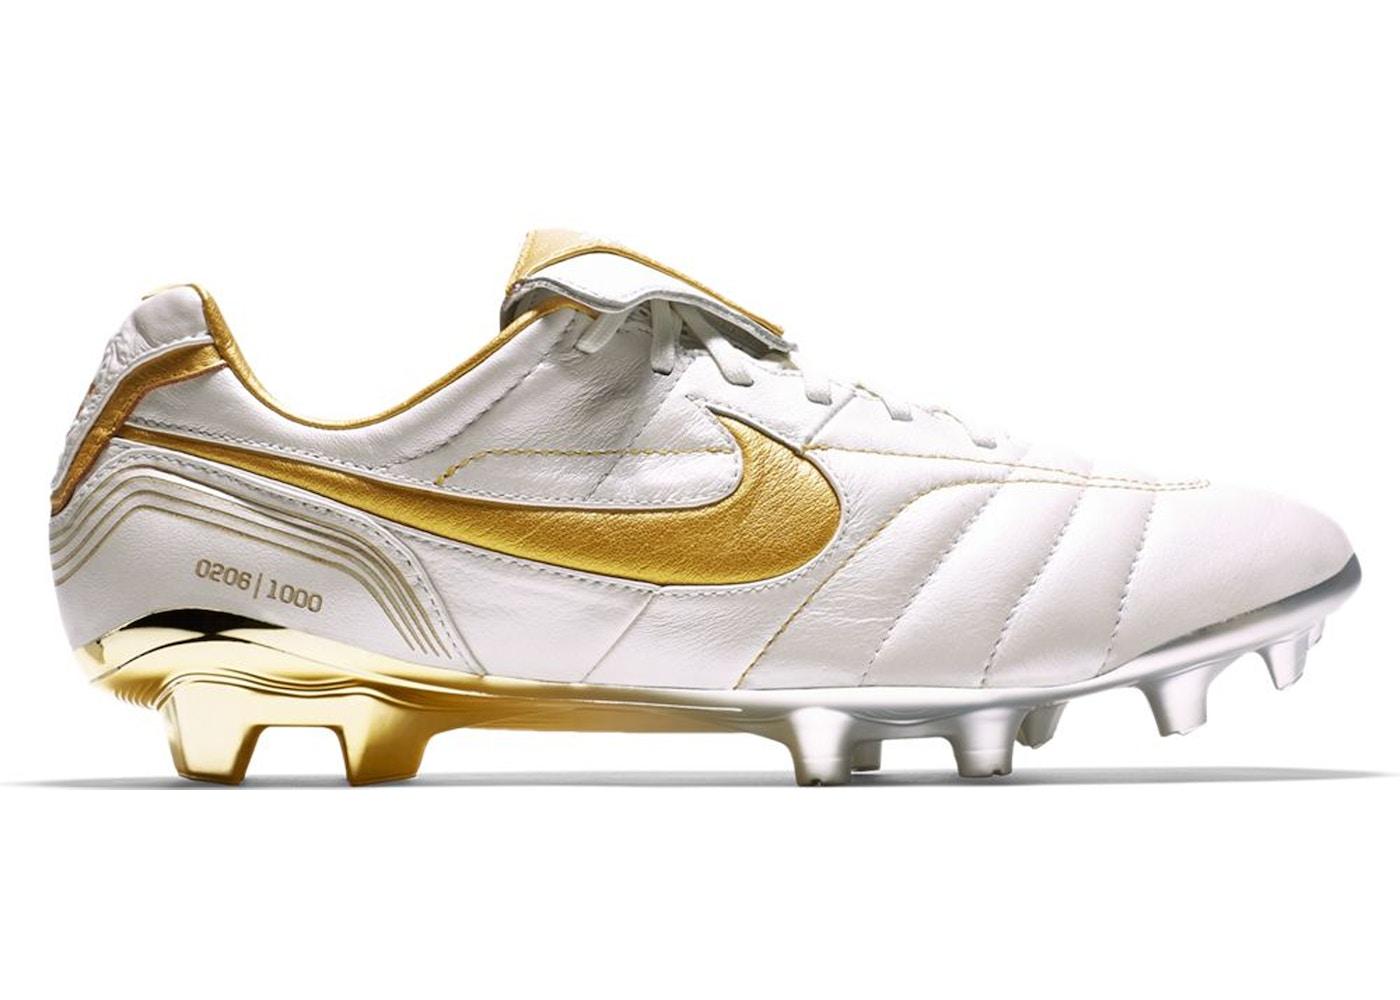 eeedd4f89 Nike Legend 7 Elite 10R FG Ronaldinho - BV5747-107